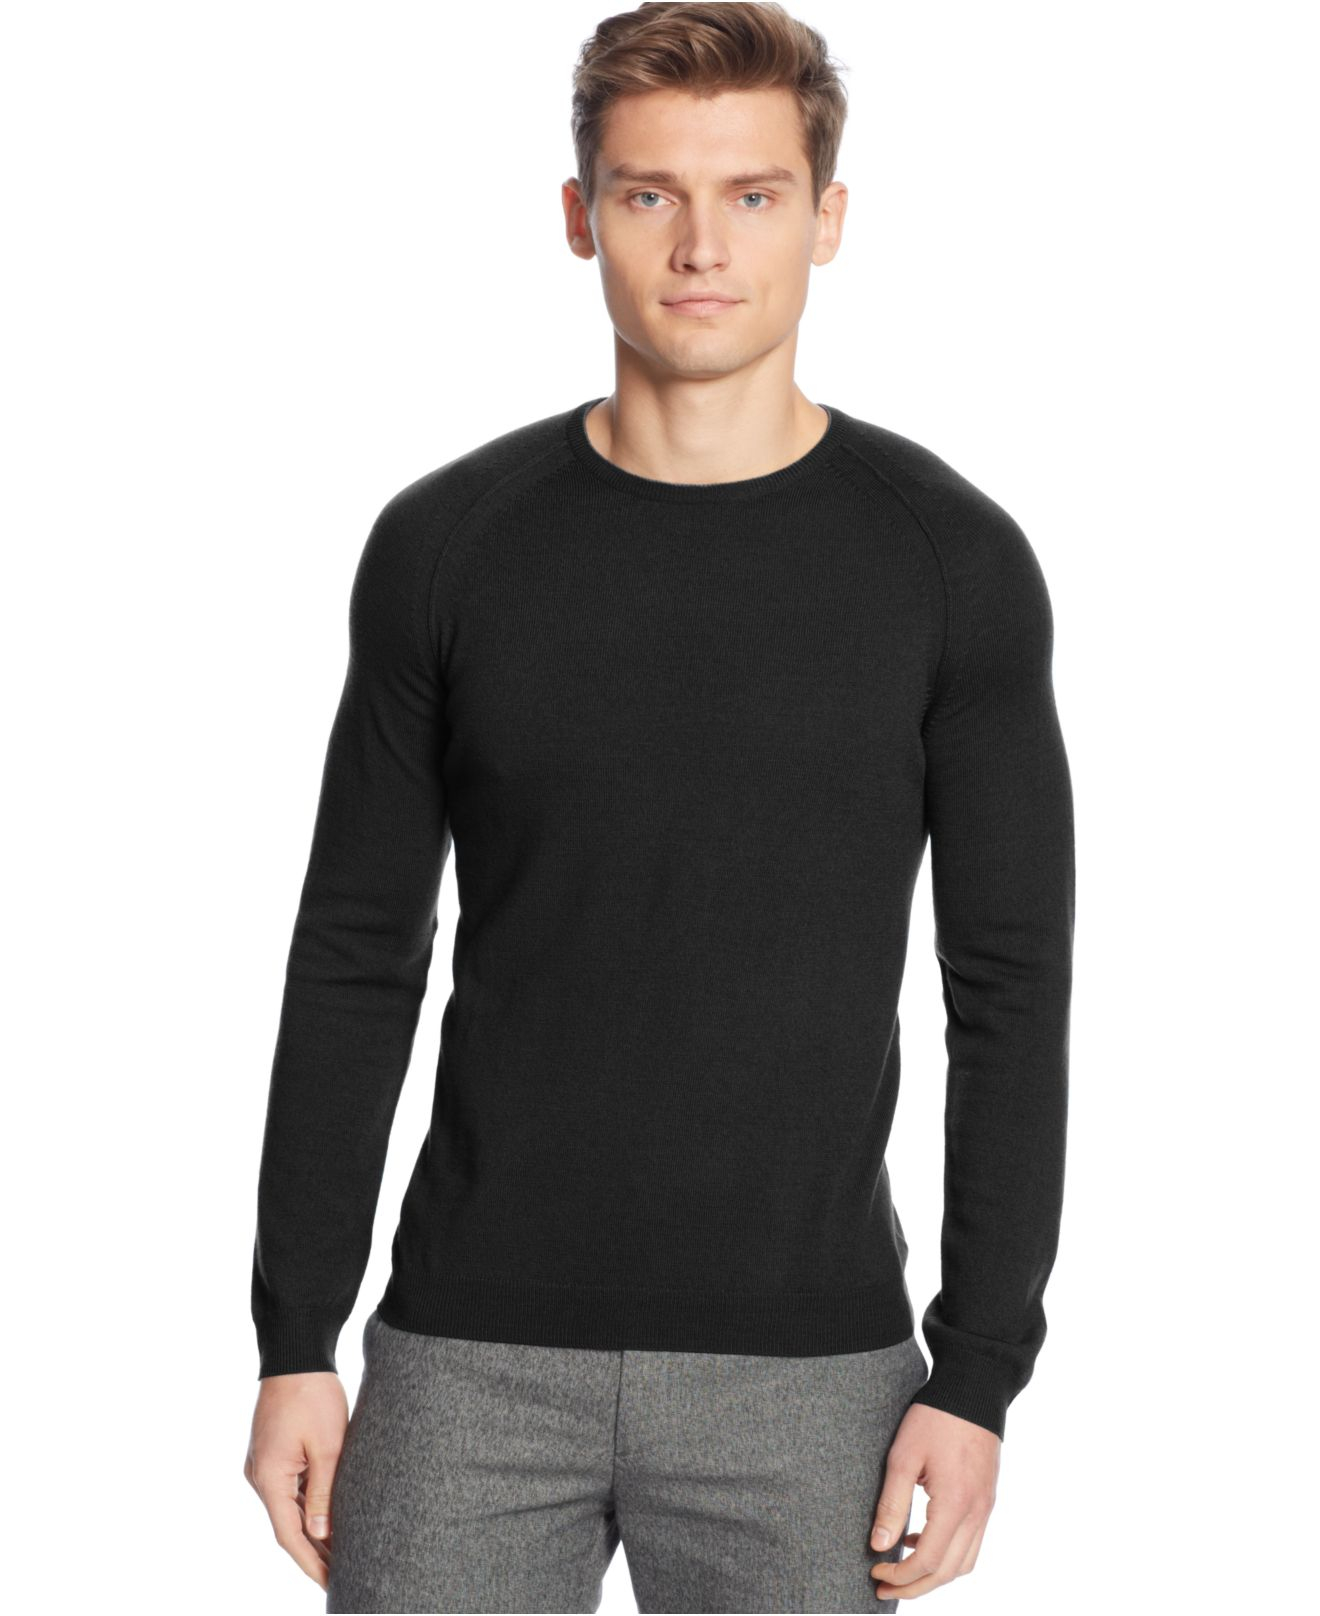 Calvin klein Solid Merino Wool Raglan Crew-Neck Sweater in Black ...